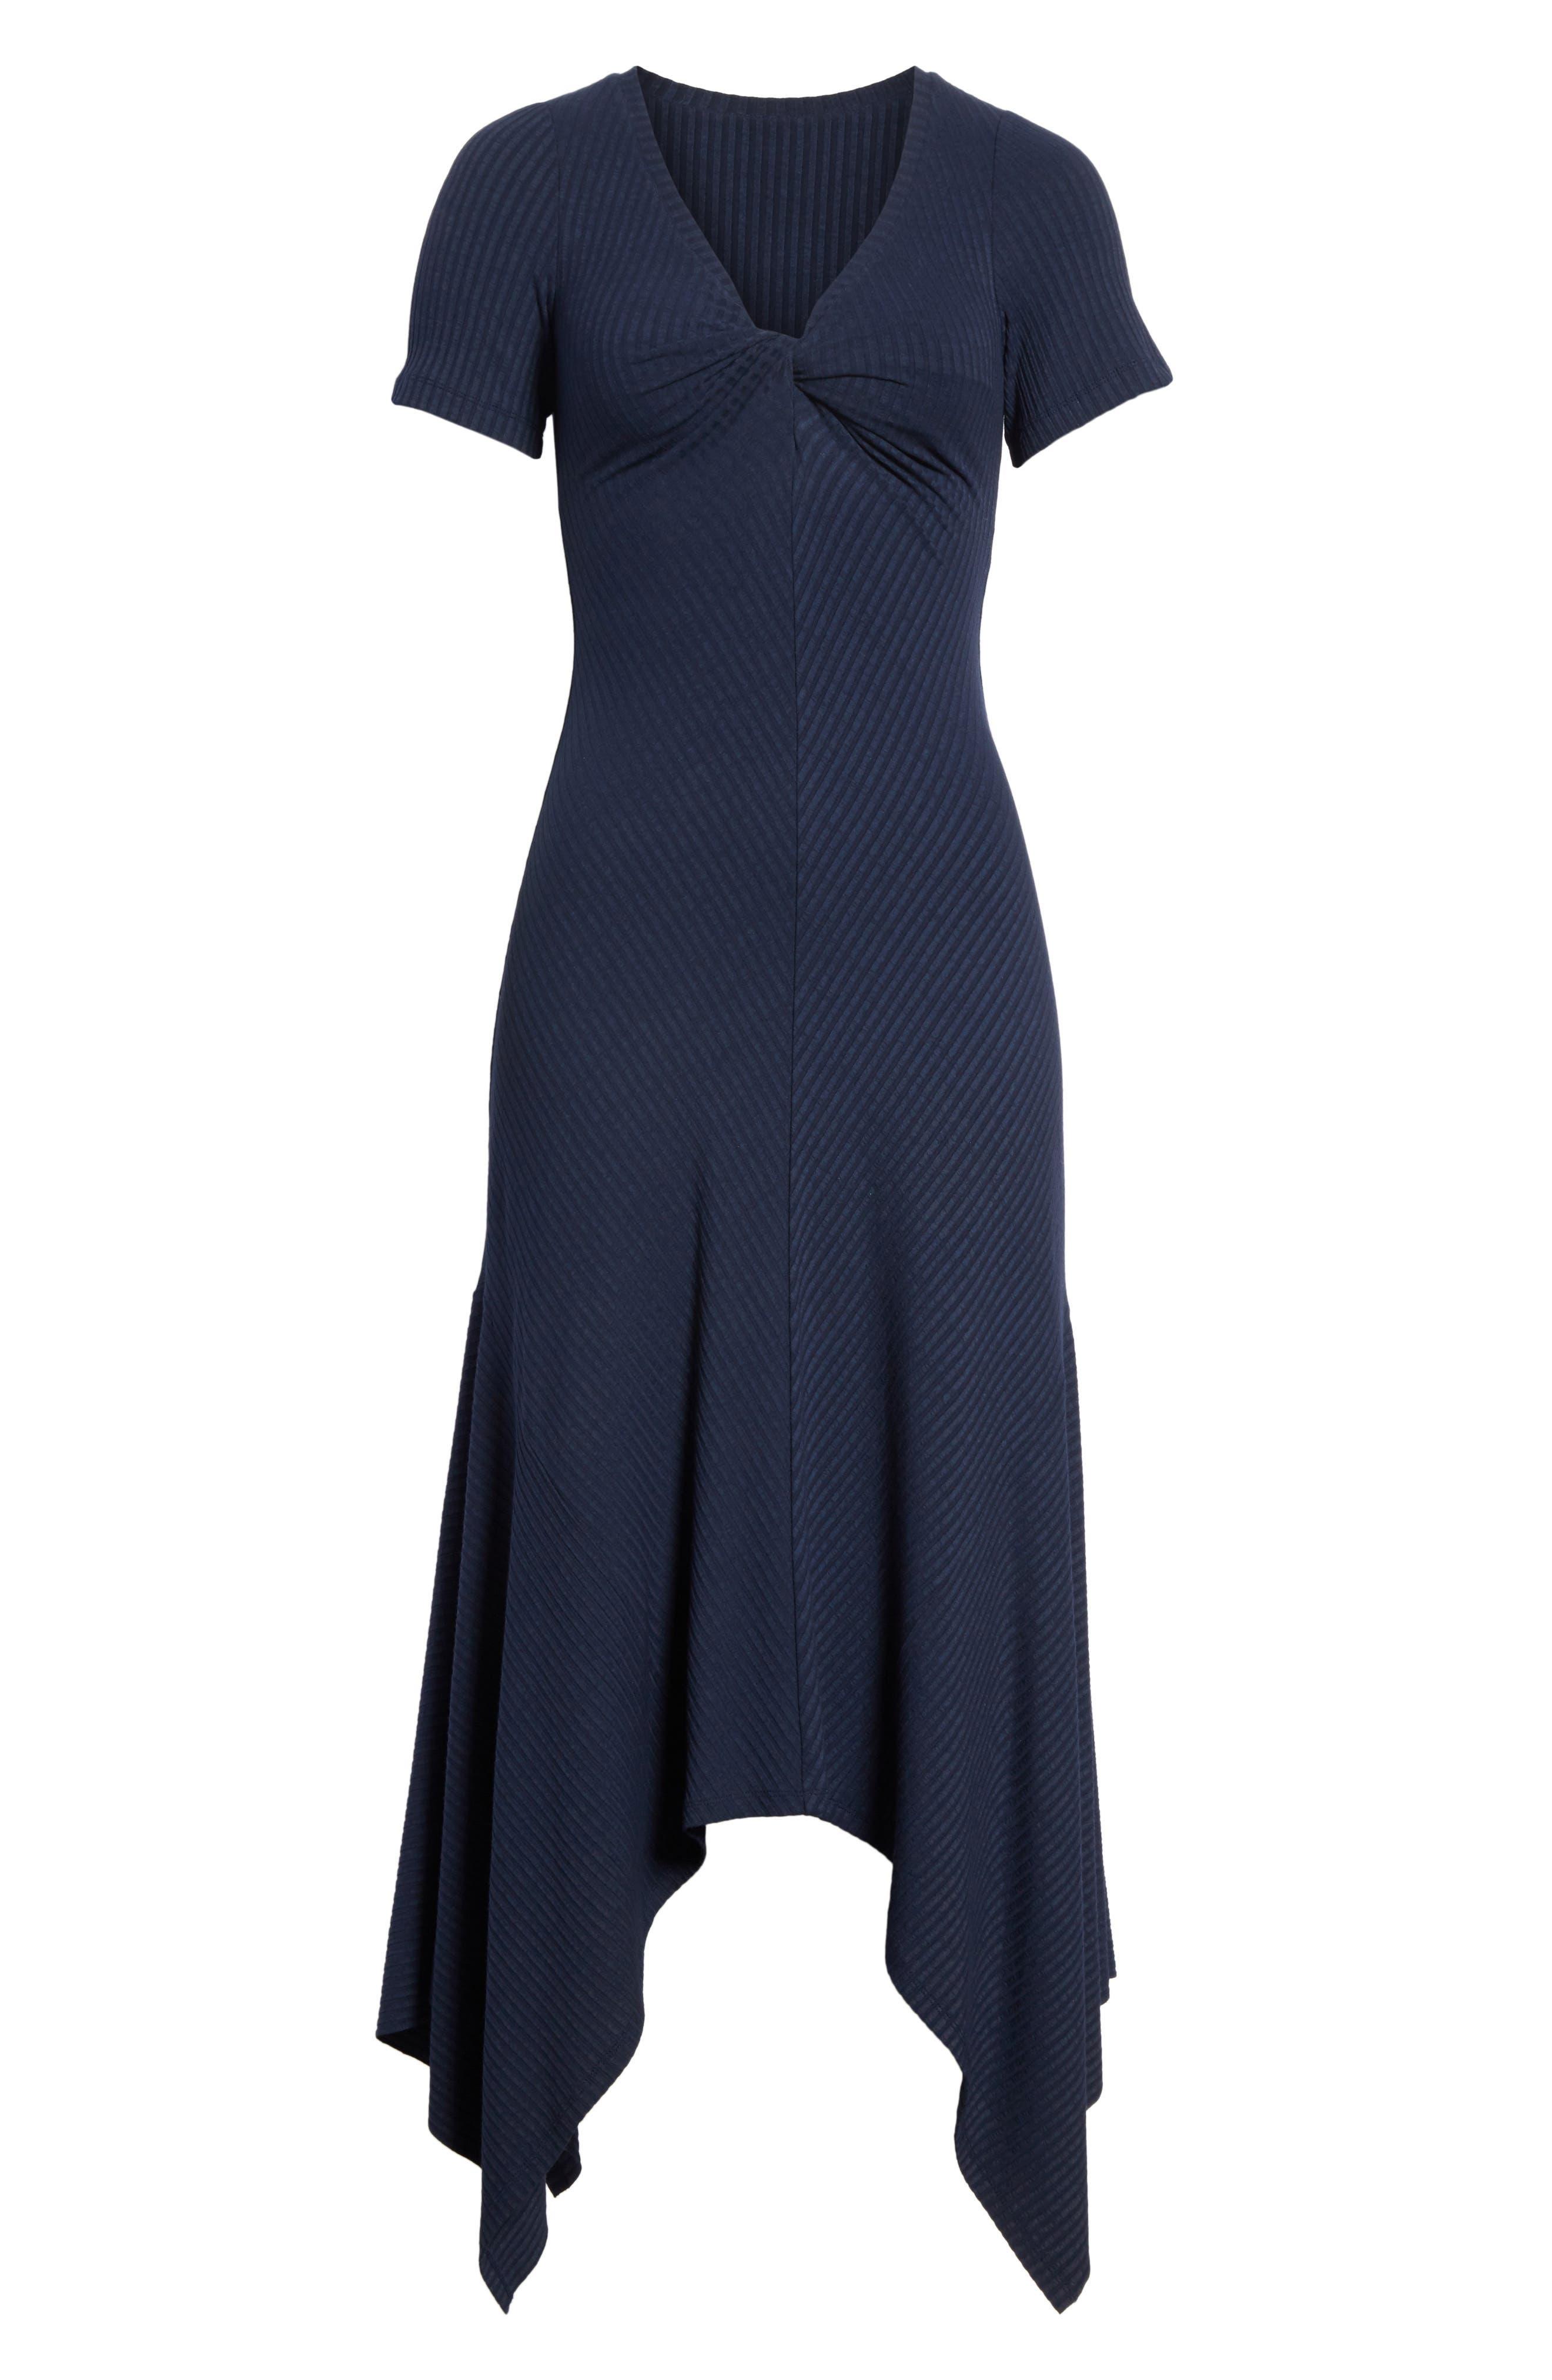 Knotted Rib Knit Midi Dress,                             Alternate thumbnail 7, color,                             Navy